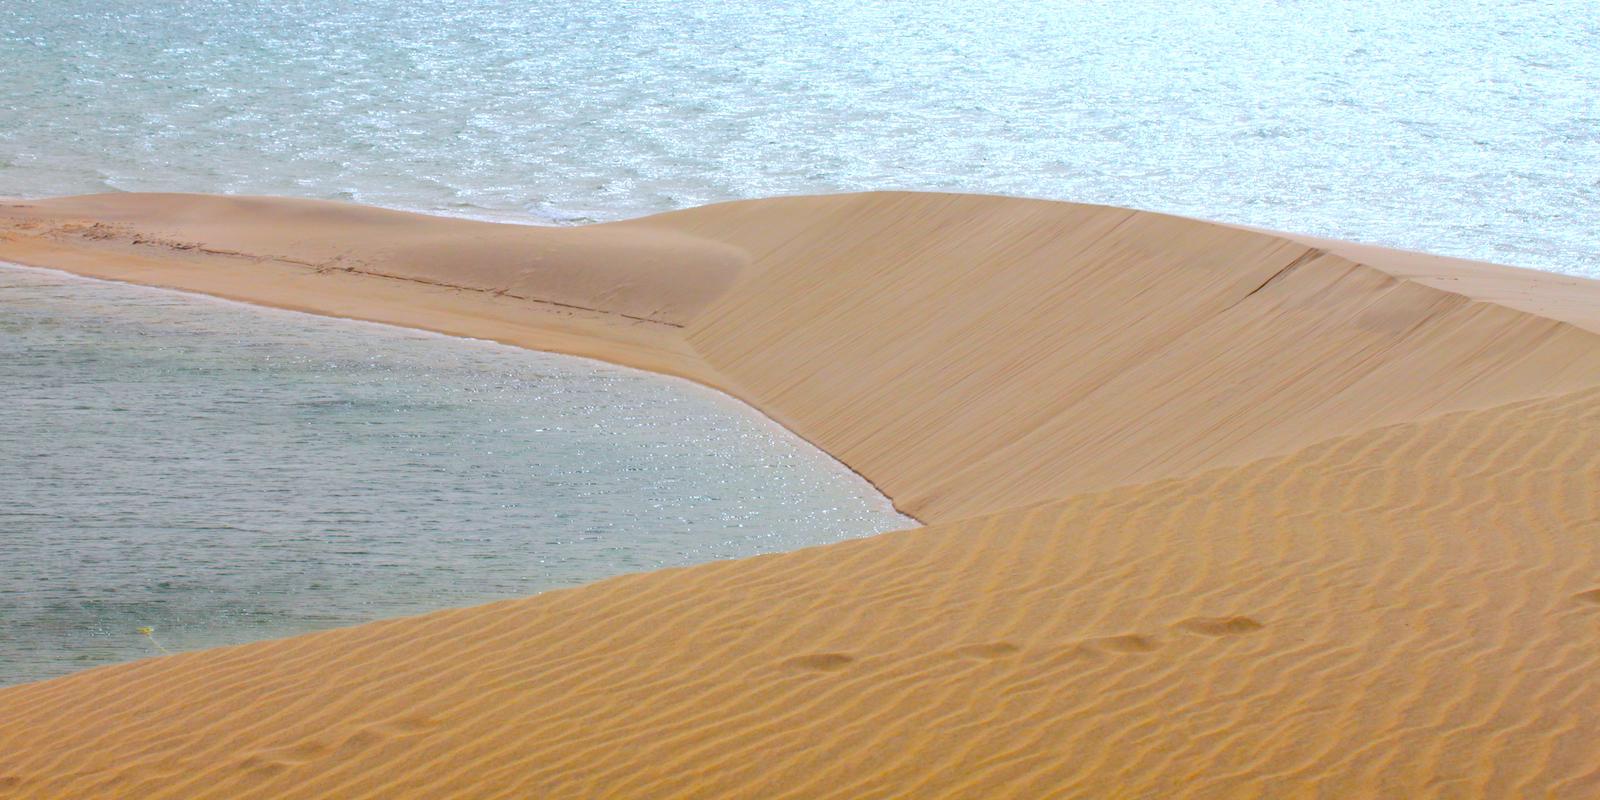 Dakhla Rovers White Dune